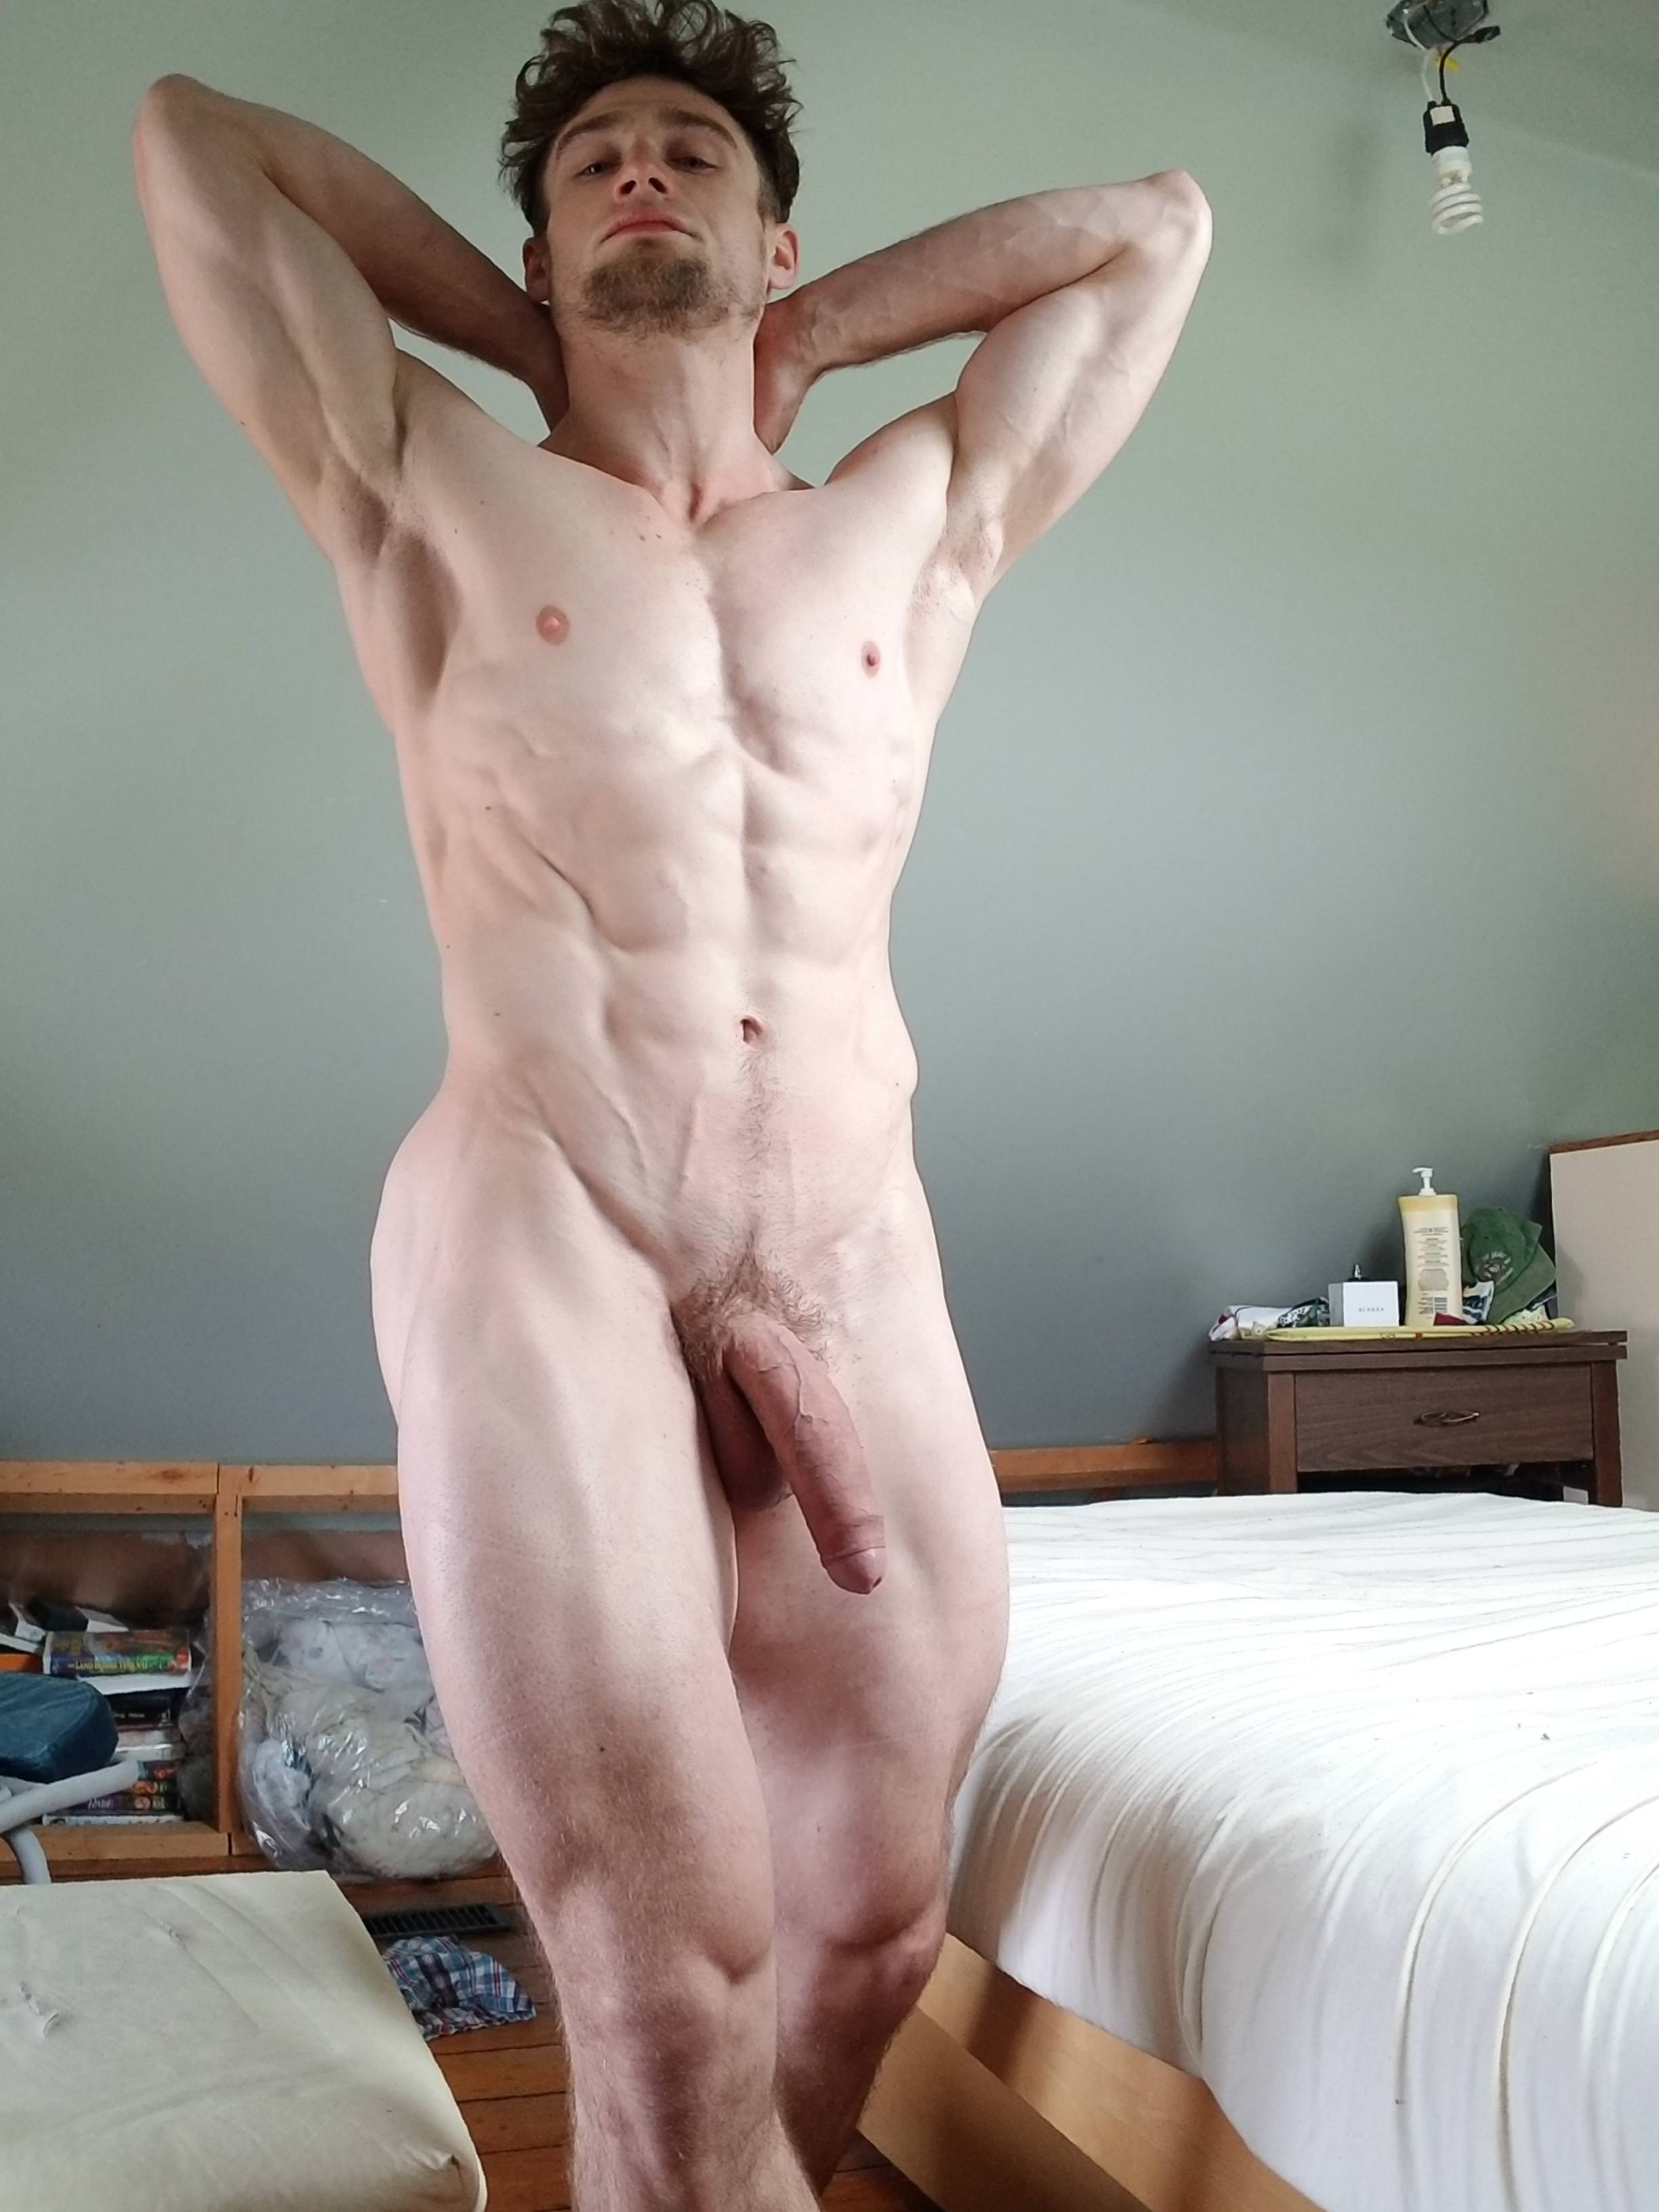 I love big dick